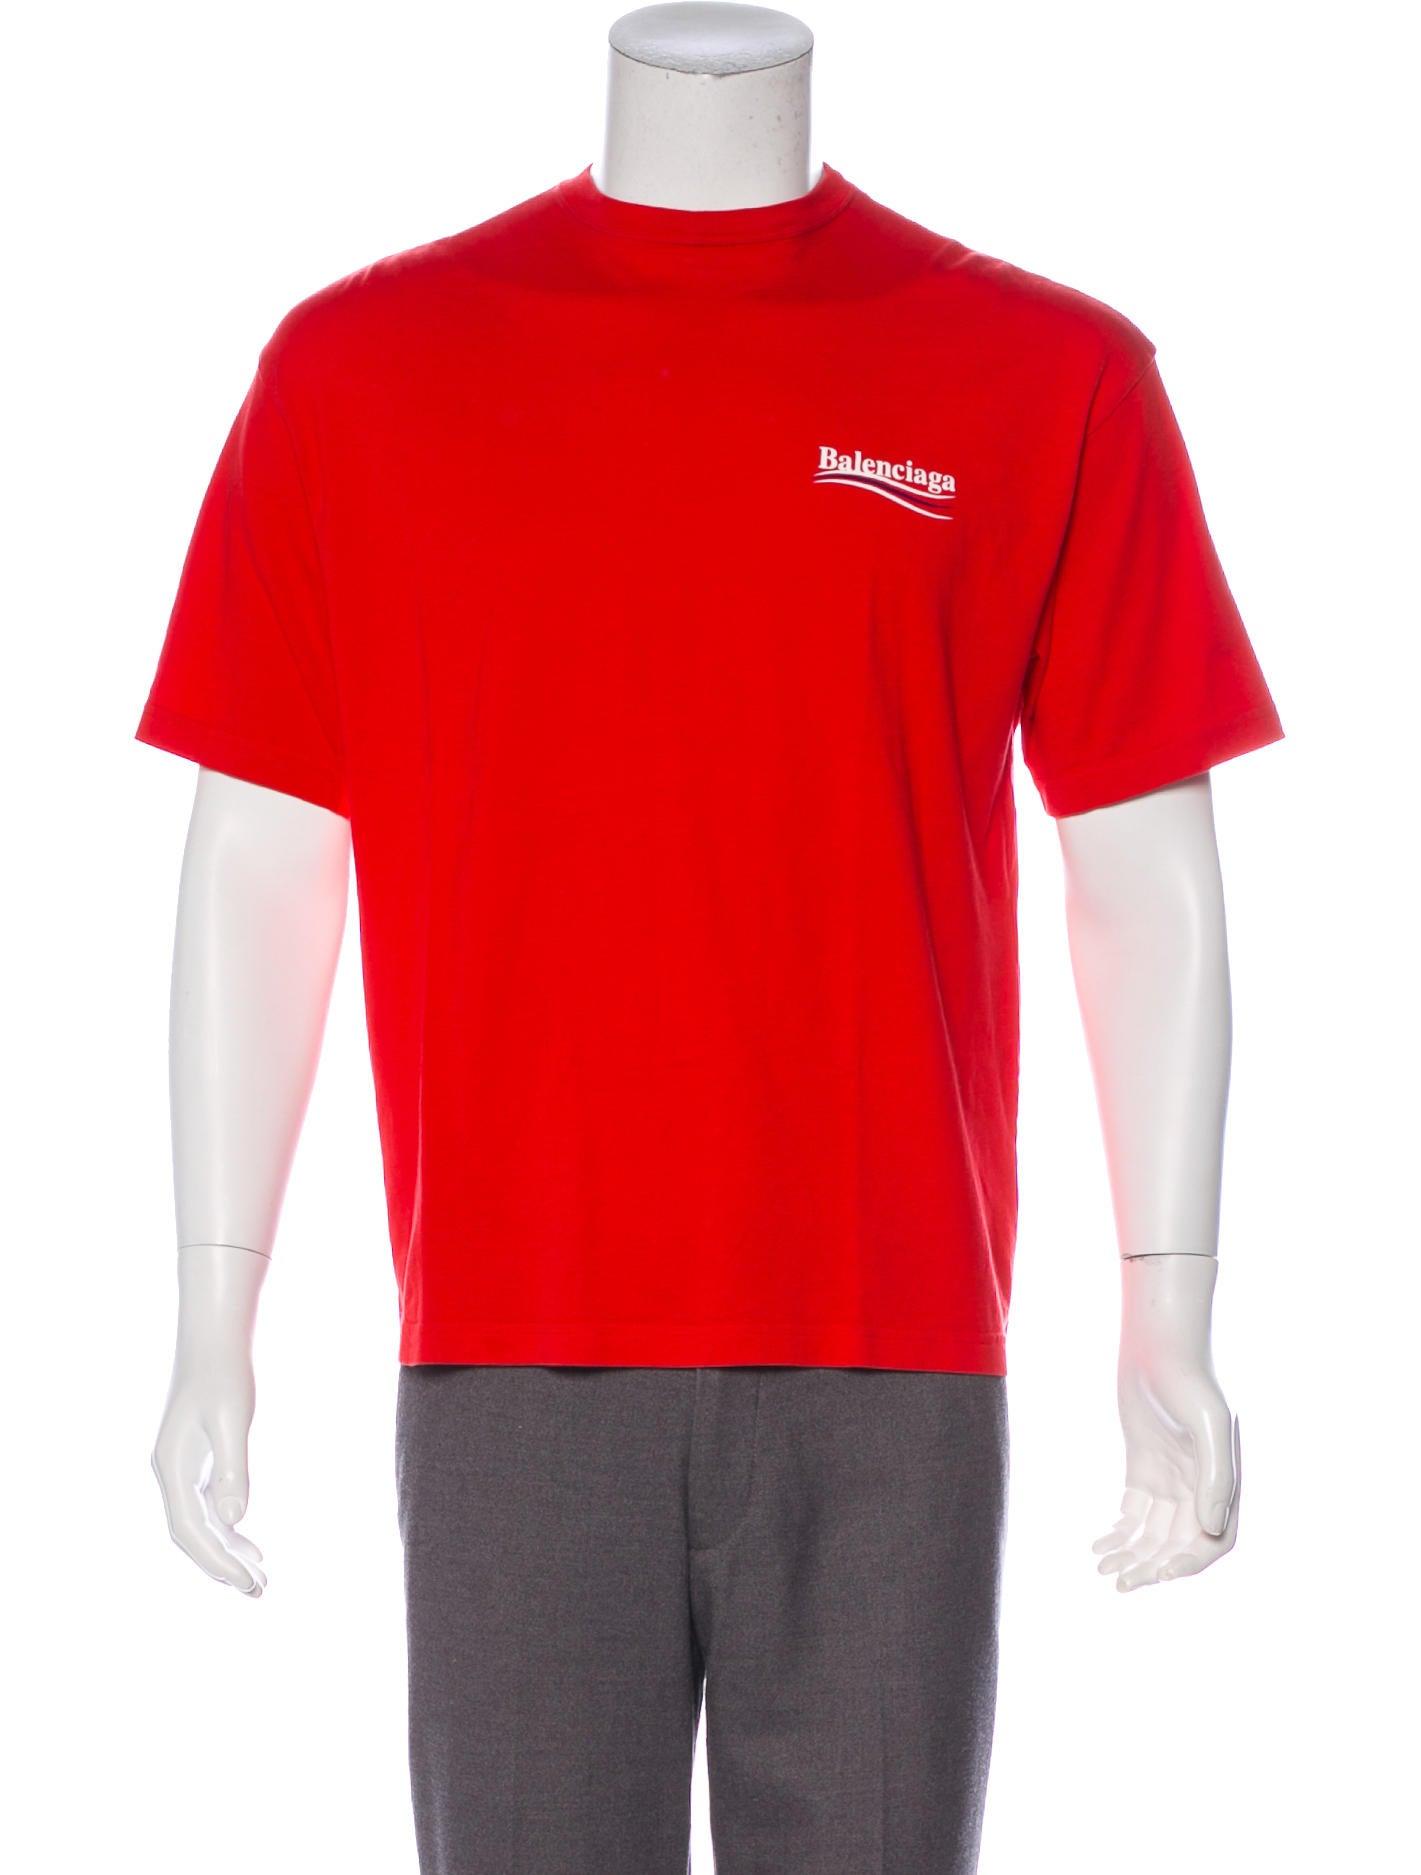 9b5197f2a Balenciaga 2017 Campaign Logo Graphic T-Shirt - Clothing - BAL85154 ...